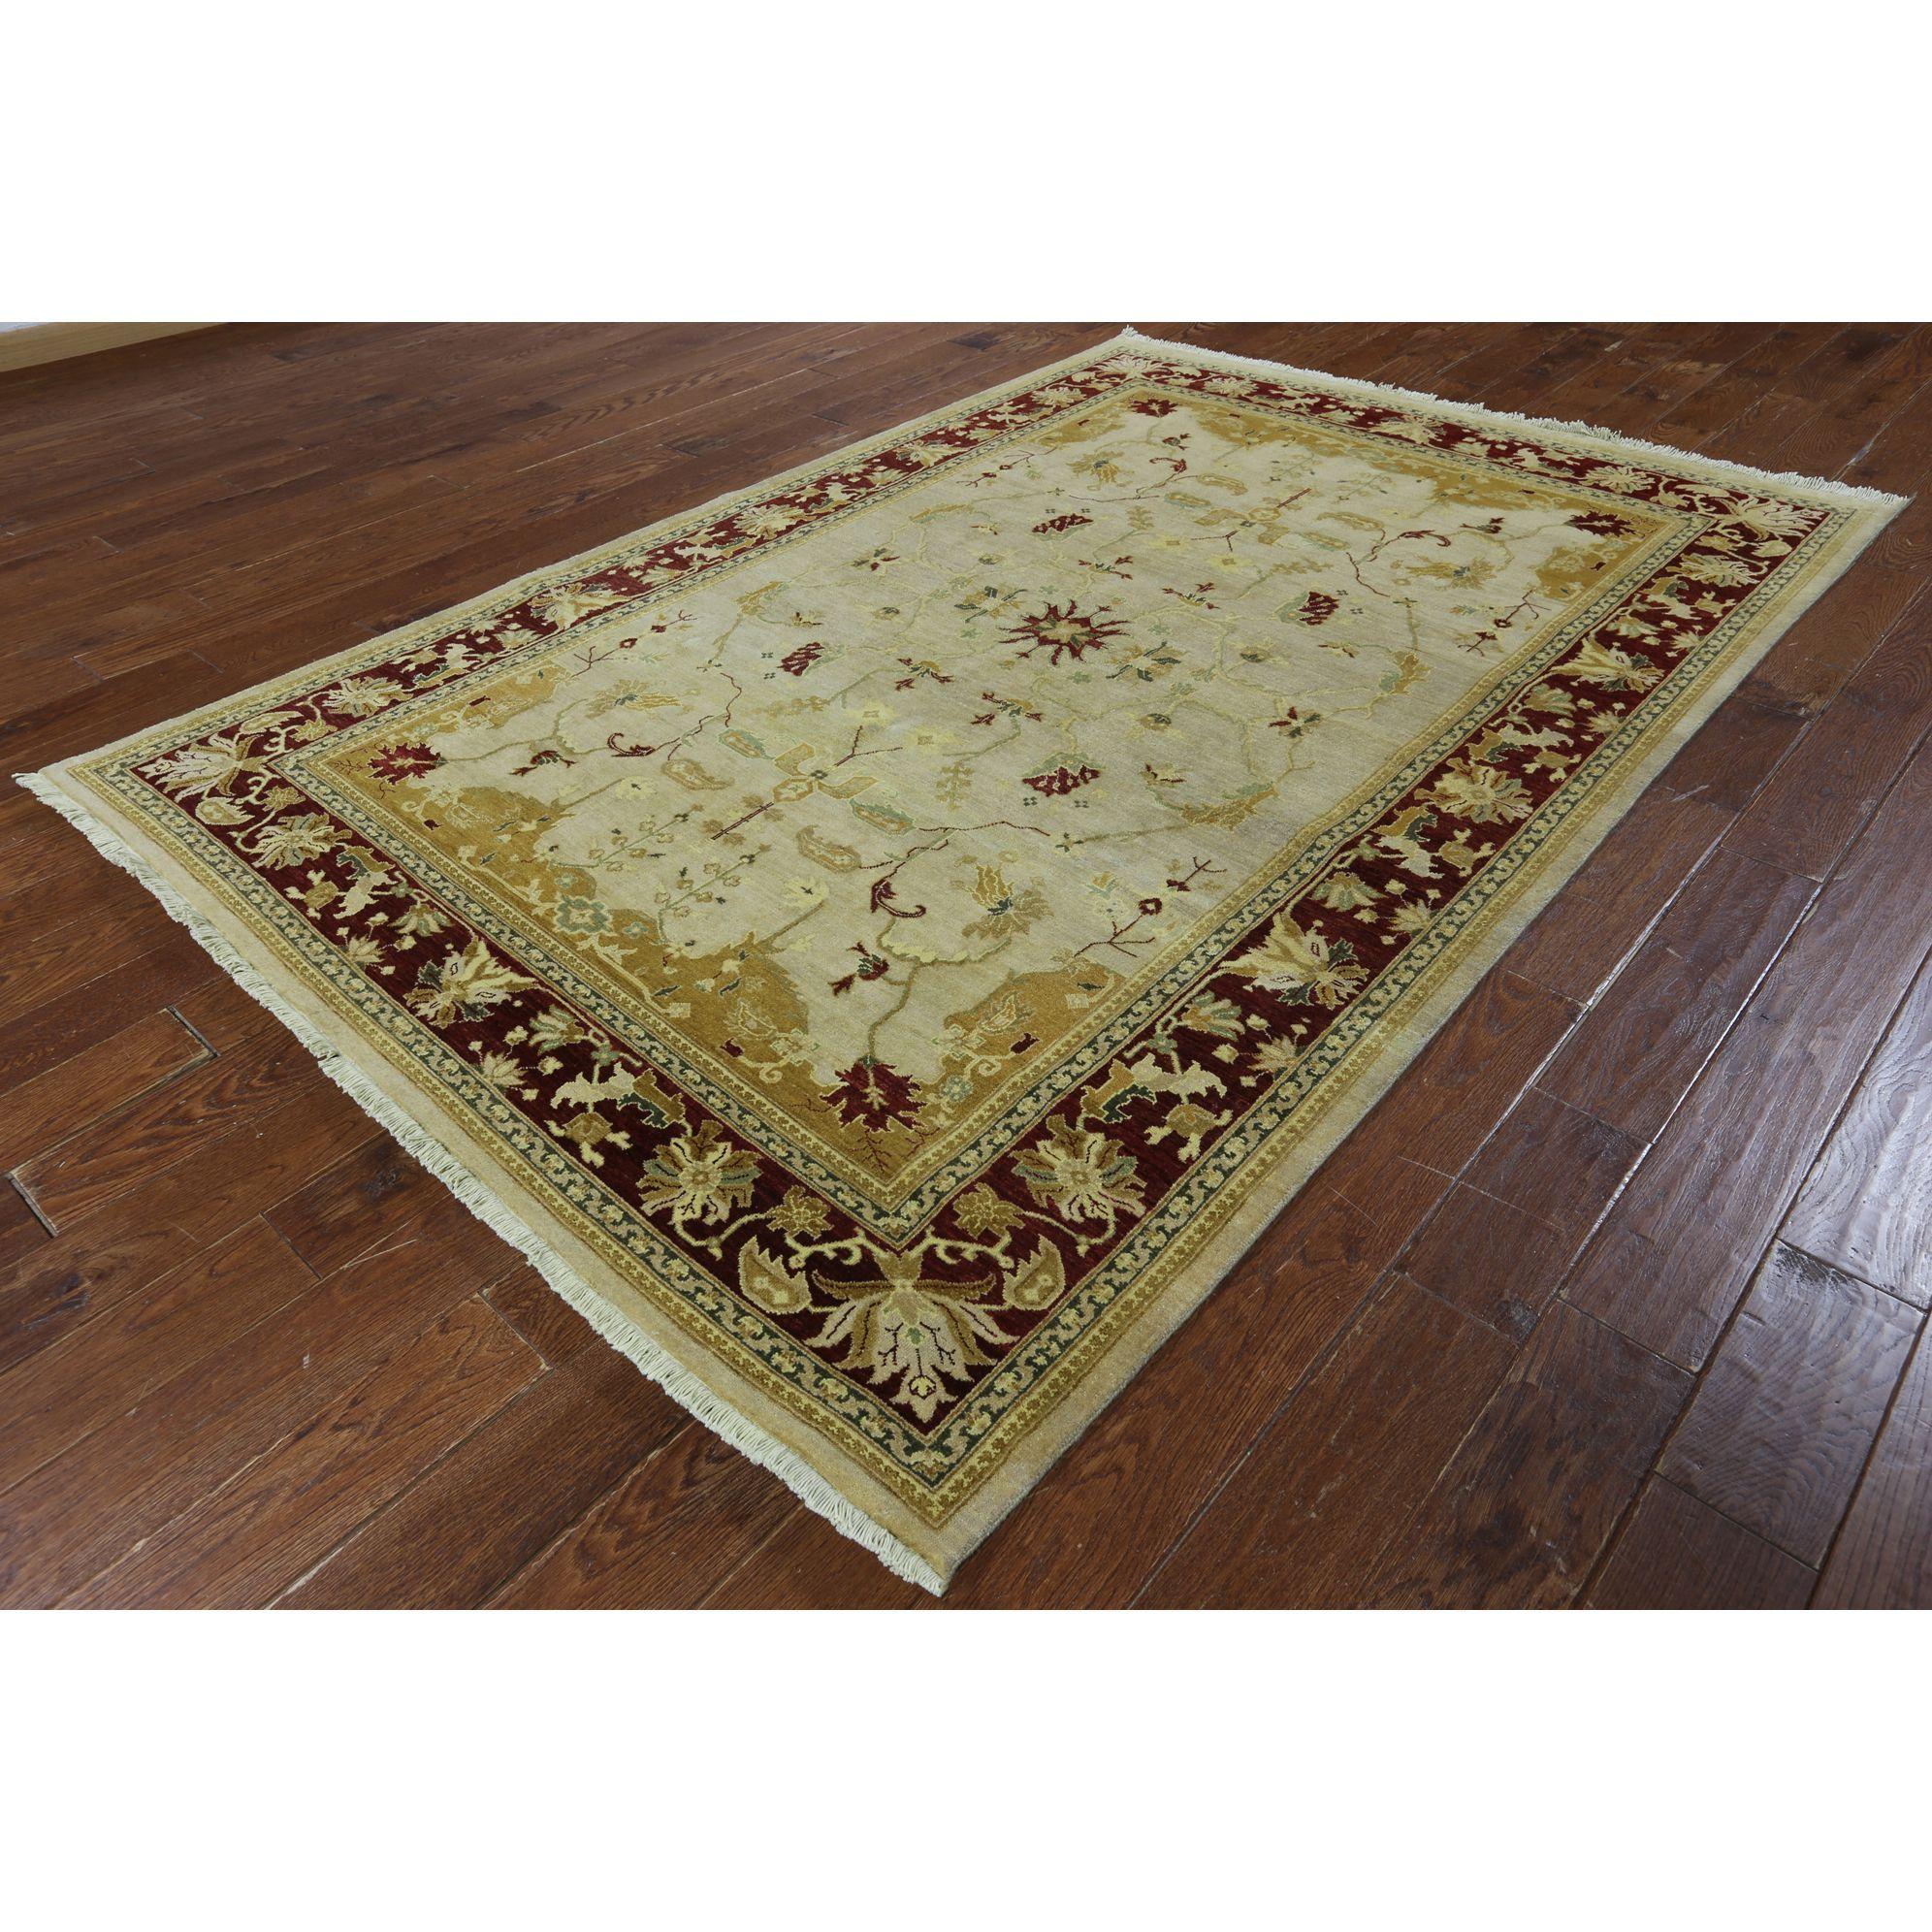 Manhattan handknotted chobi peshawar gold area rug products